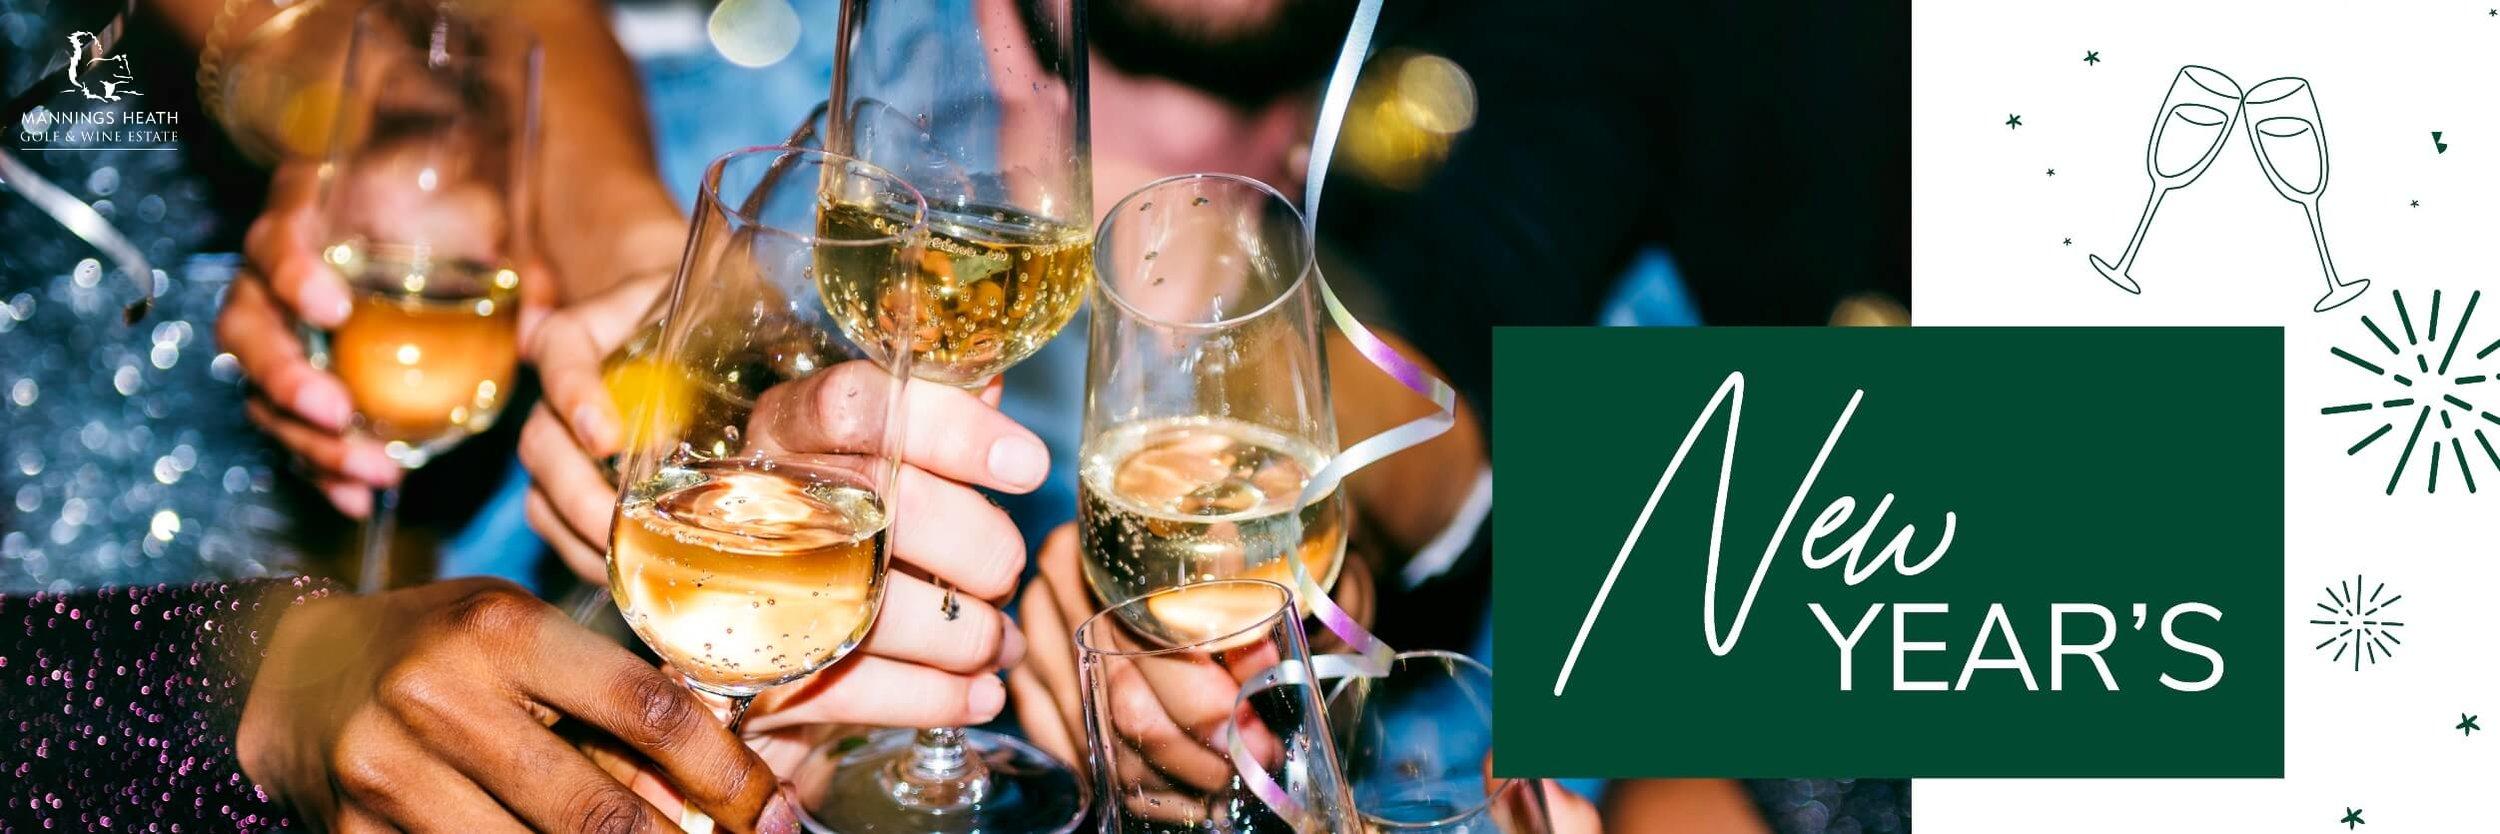 New-Years-Eve-2019-Mannings-Heath-Golf-and-wine-estate.jpg